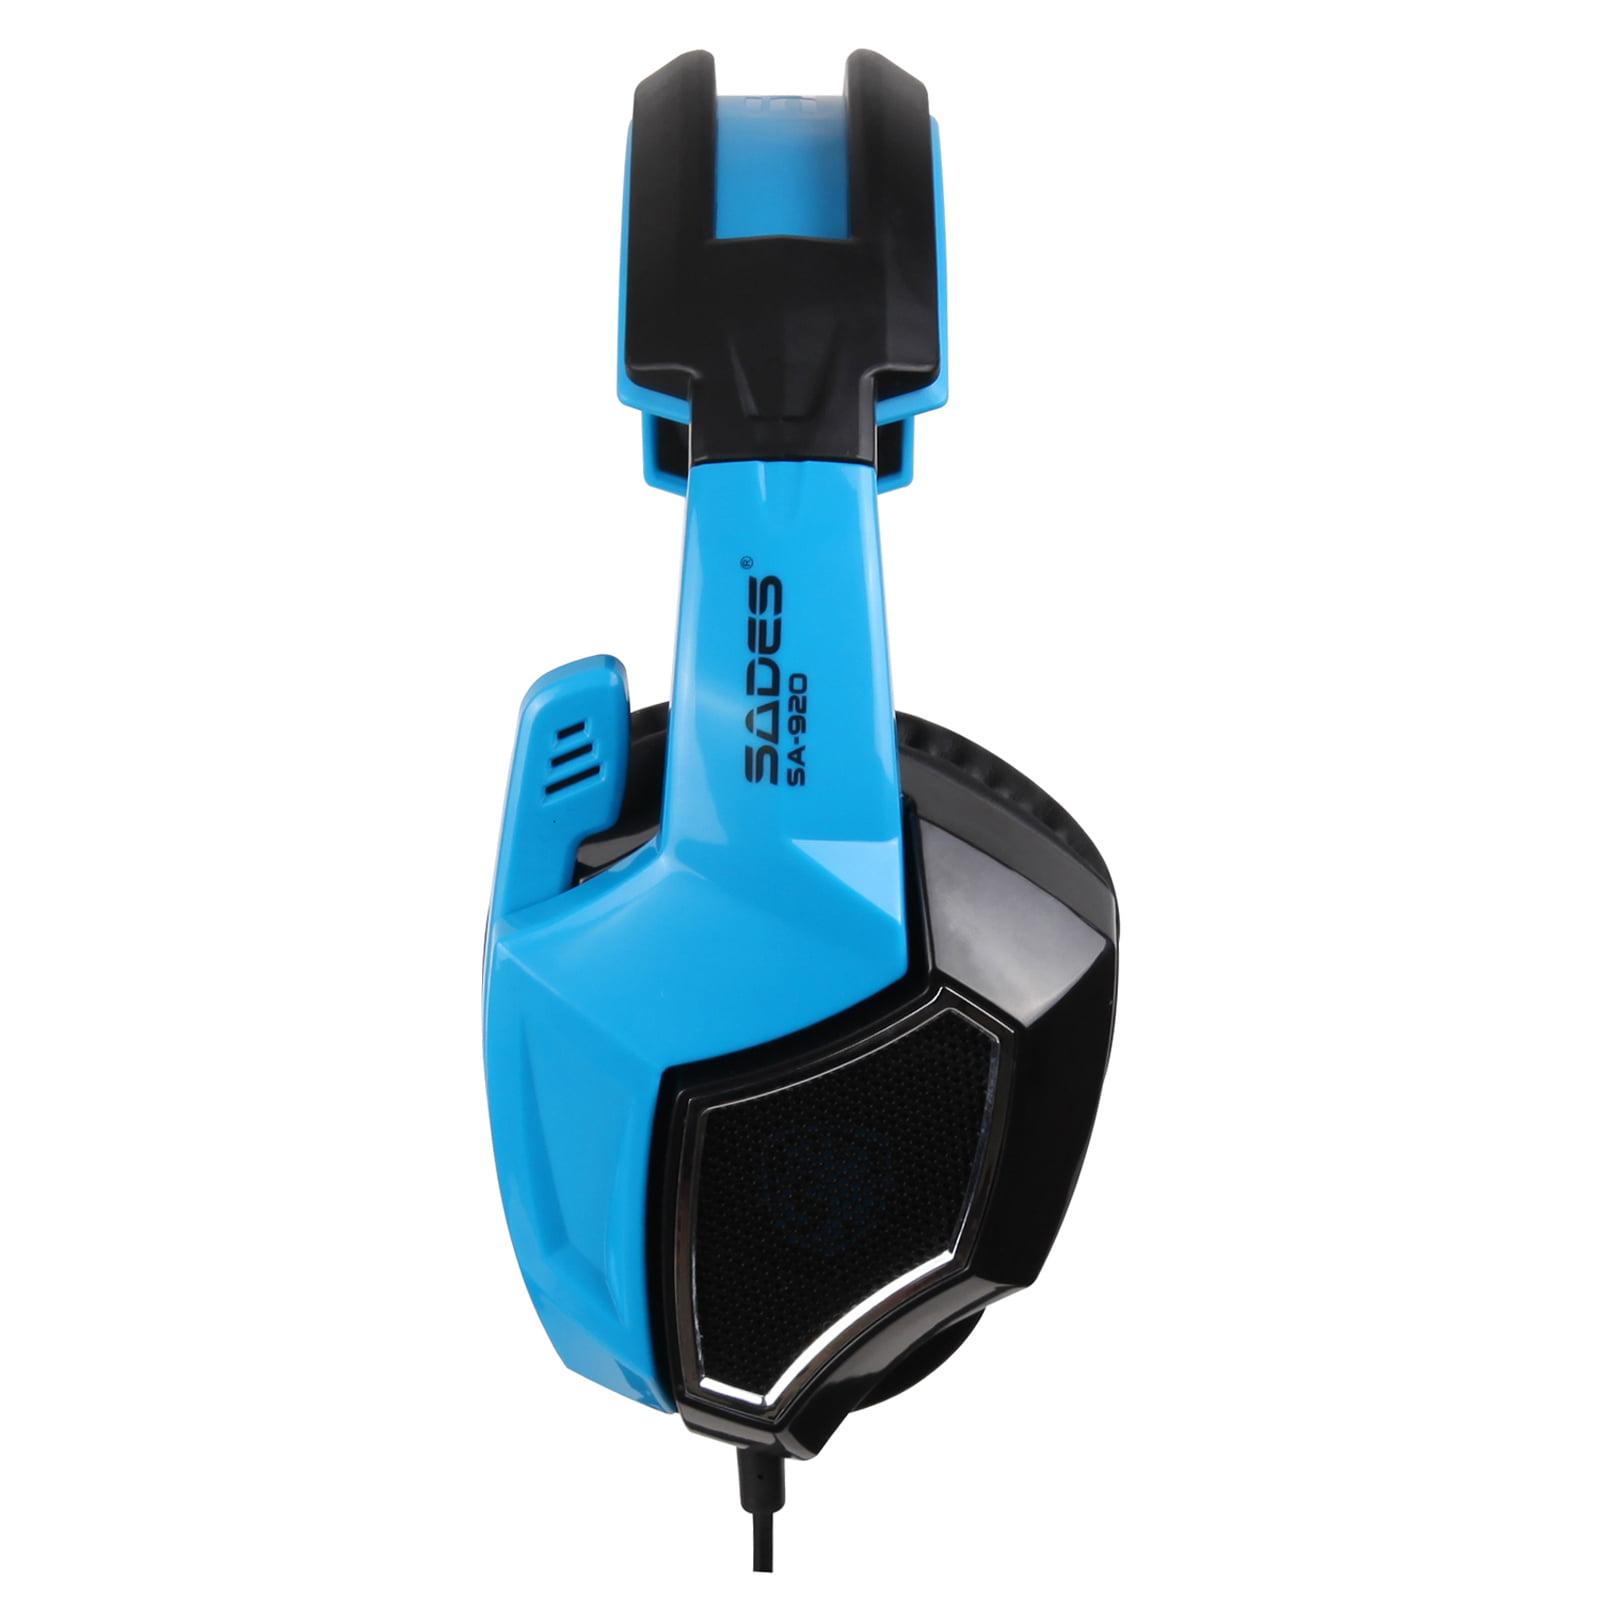 Cheerwing Sades SA-920 5 in 1 Stereo Gaming Headset Headphone with ...